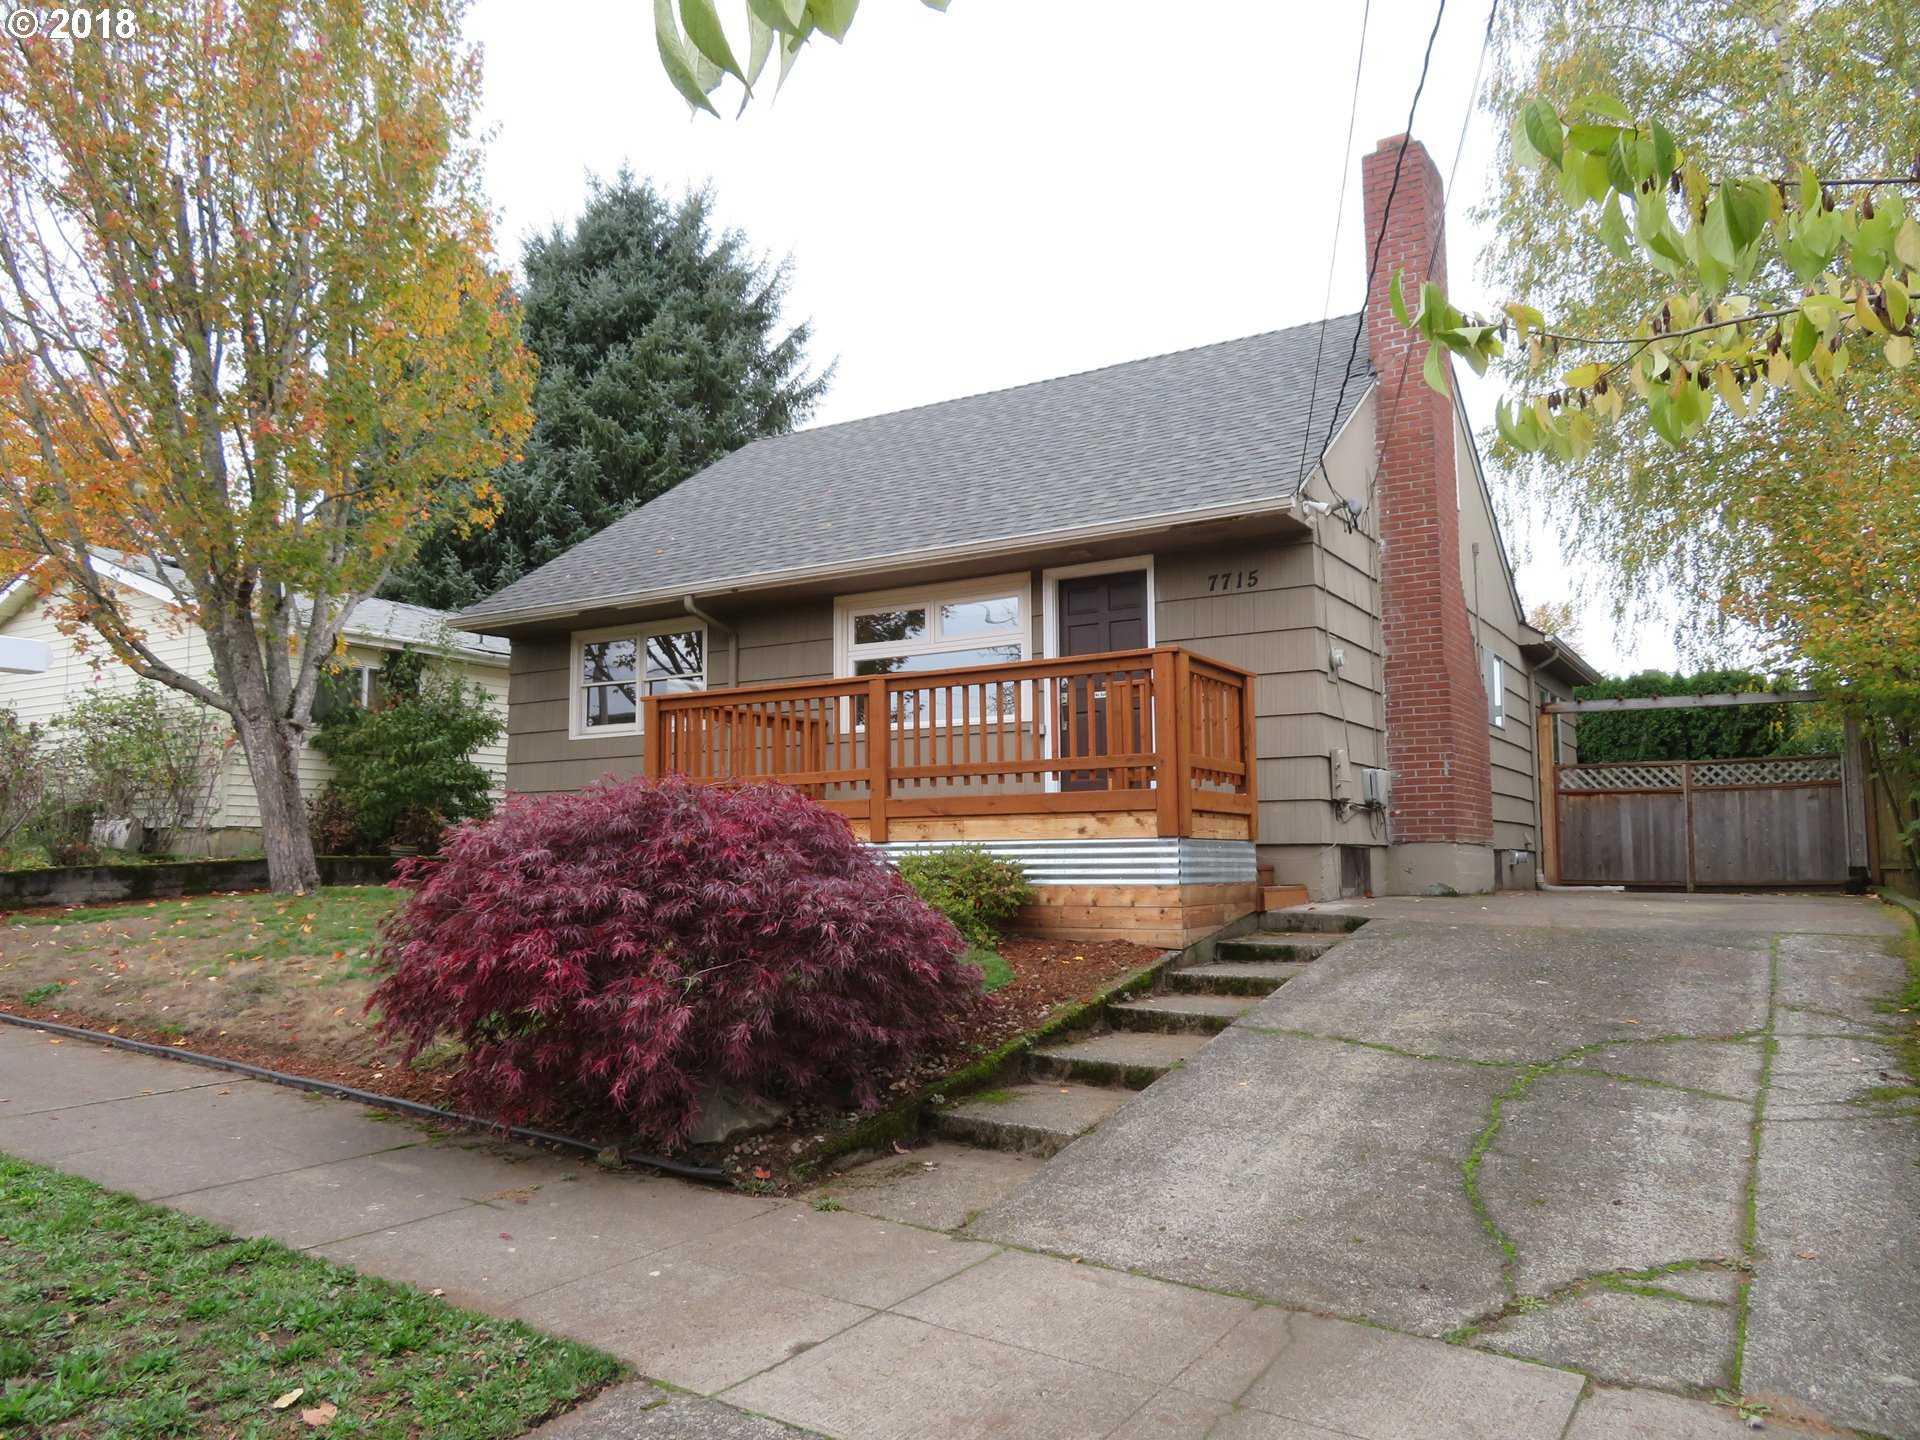 $485,000 - 4Br/3Ba -  for Sale in Mt Tabor, Montavilla, Portland